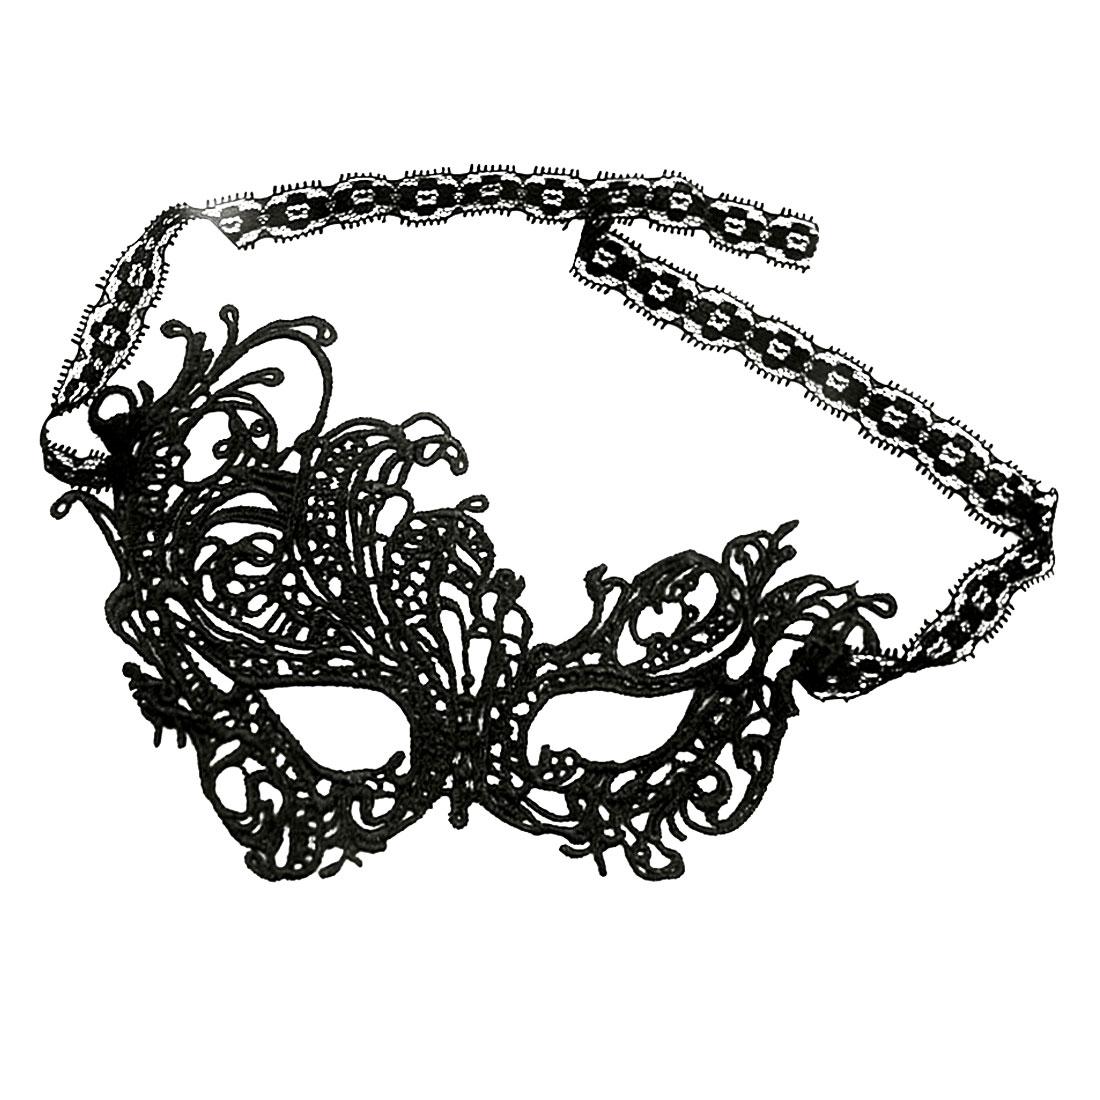 Women Crochet Self Tie Swan Party Masquerade Mask Black